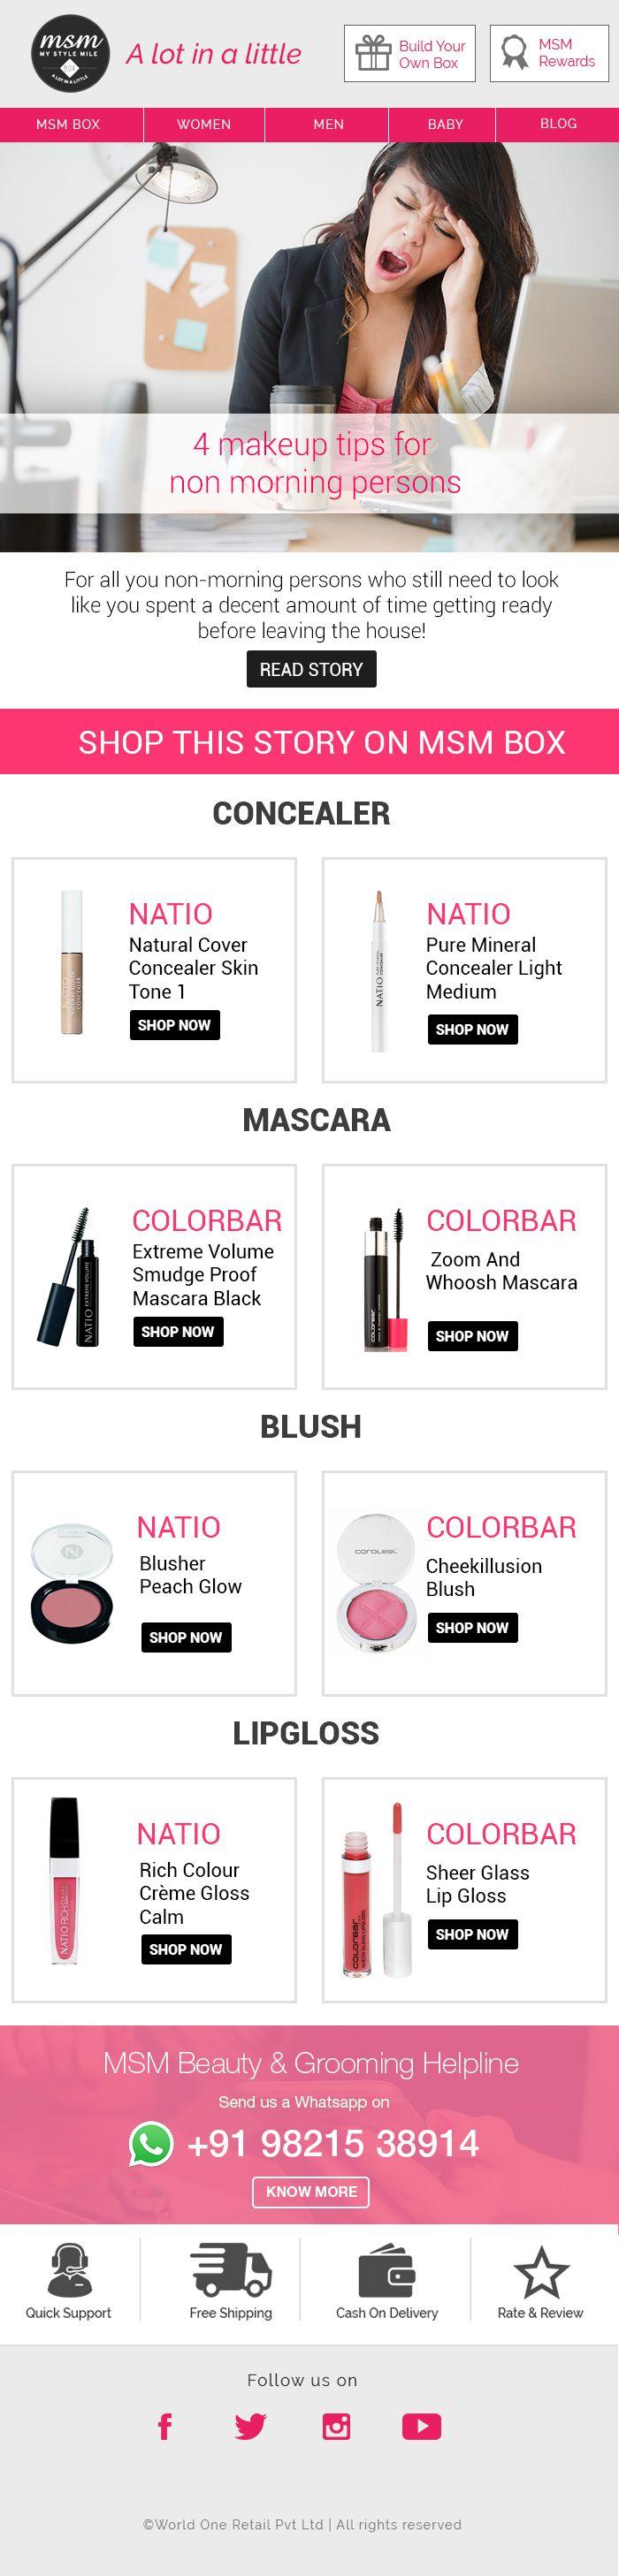 #makeup #lipgloss #beauty #mascara Shop: msmbox.com